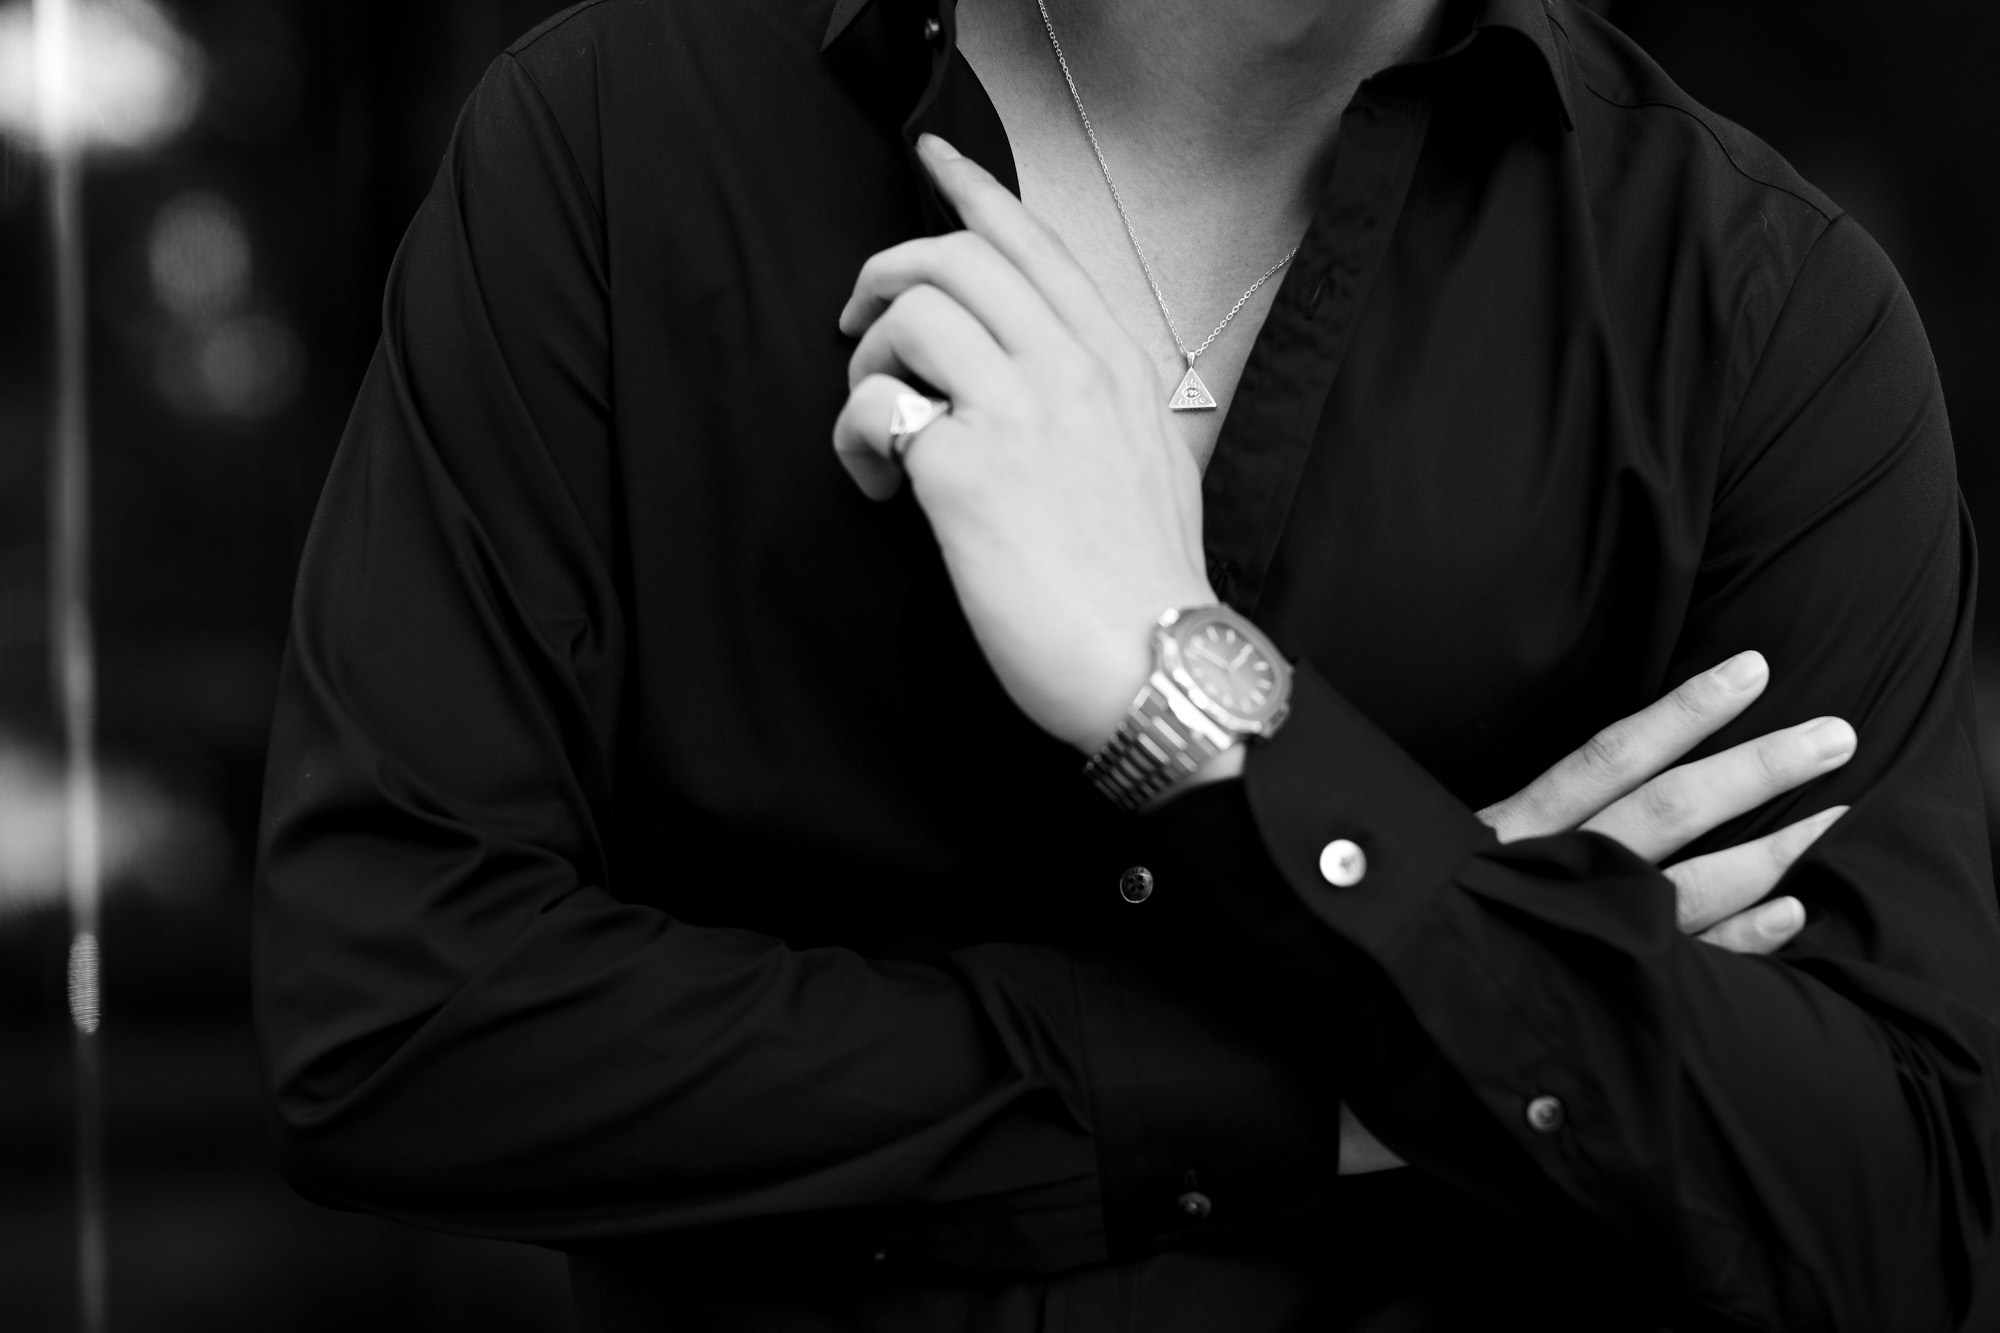 FIXER(フィクサー) ILLUMINATI EYES NECKLACE 925 STERLING SILVER(925 スターリングシルバー) イルミナティ アイズネックレス SILVER(シルバー) 愛知 名古屋 Alto e Diritto altoediritto アルトエデリット ネックレス イルミナティネックレス